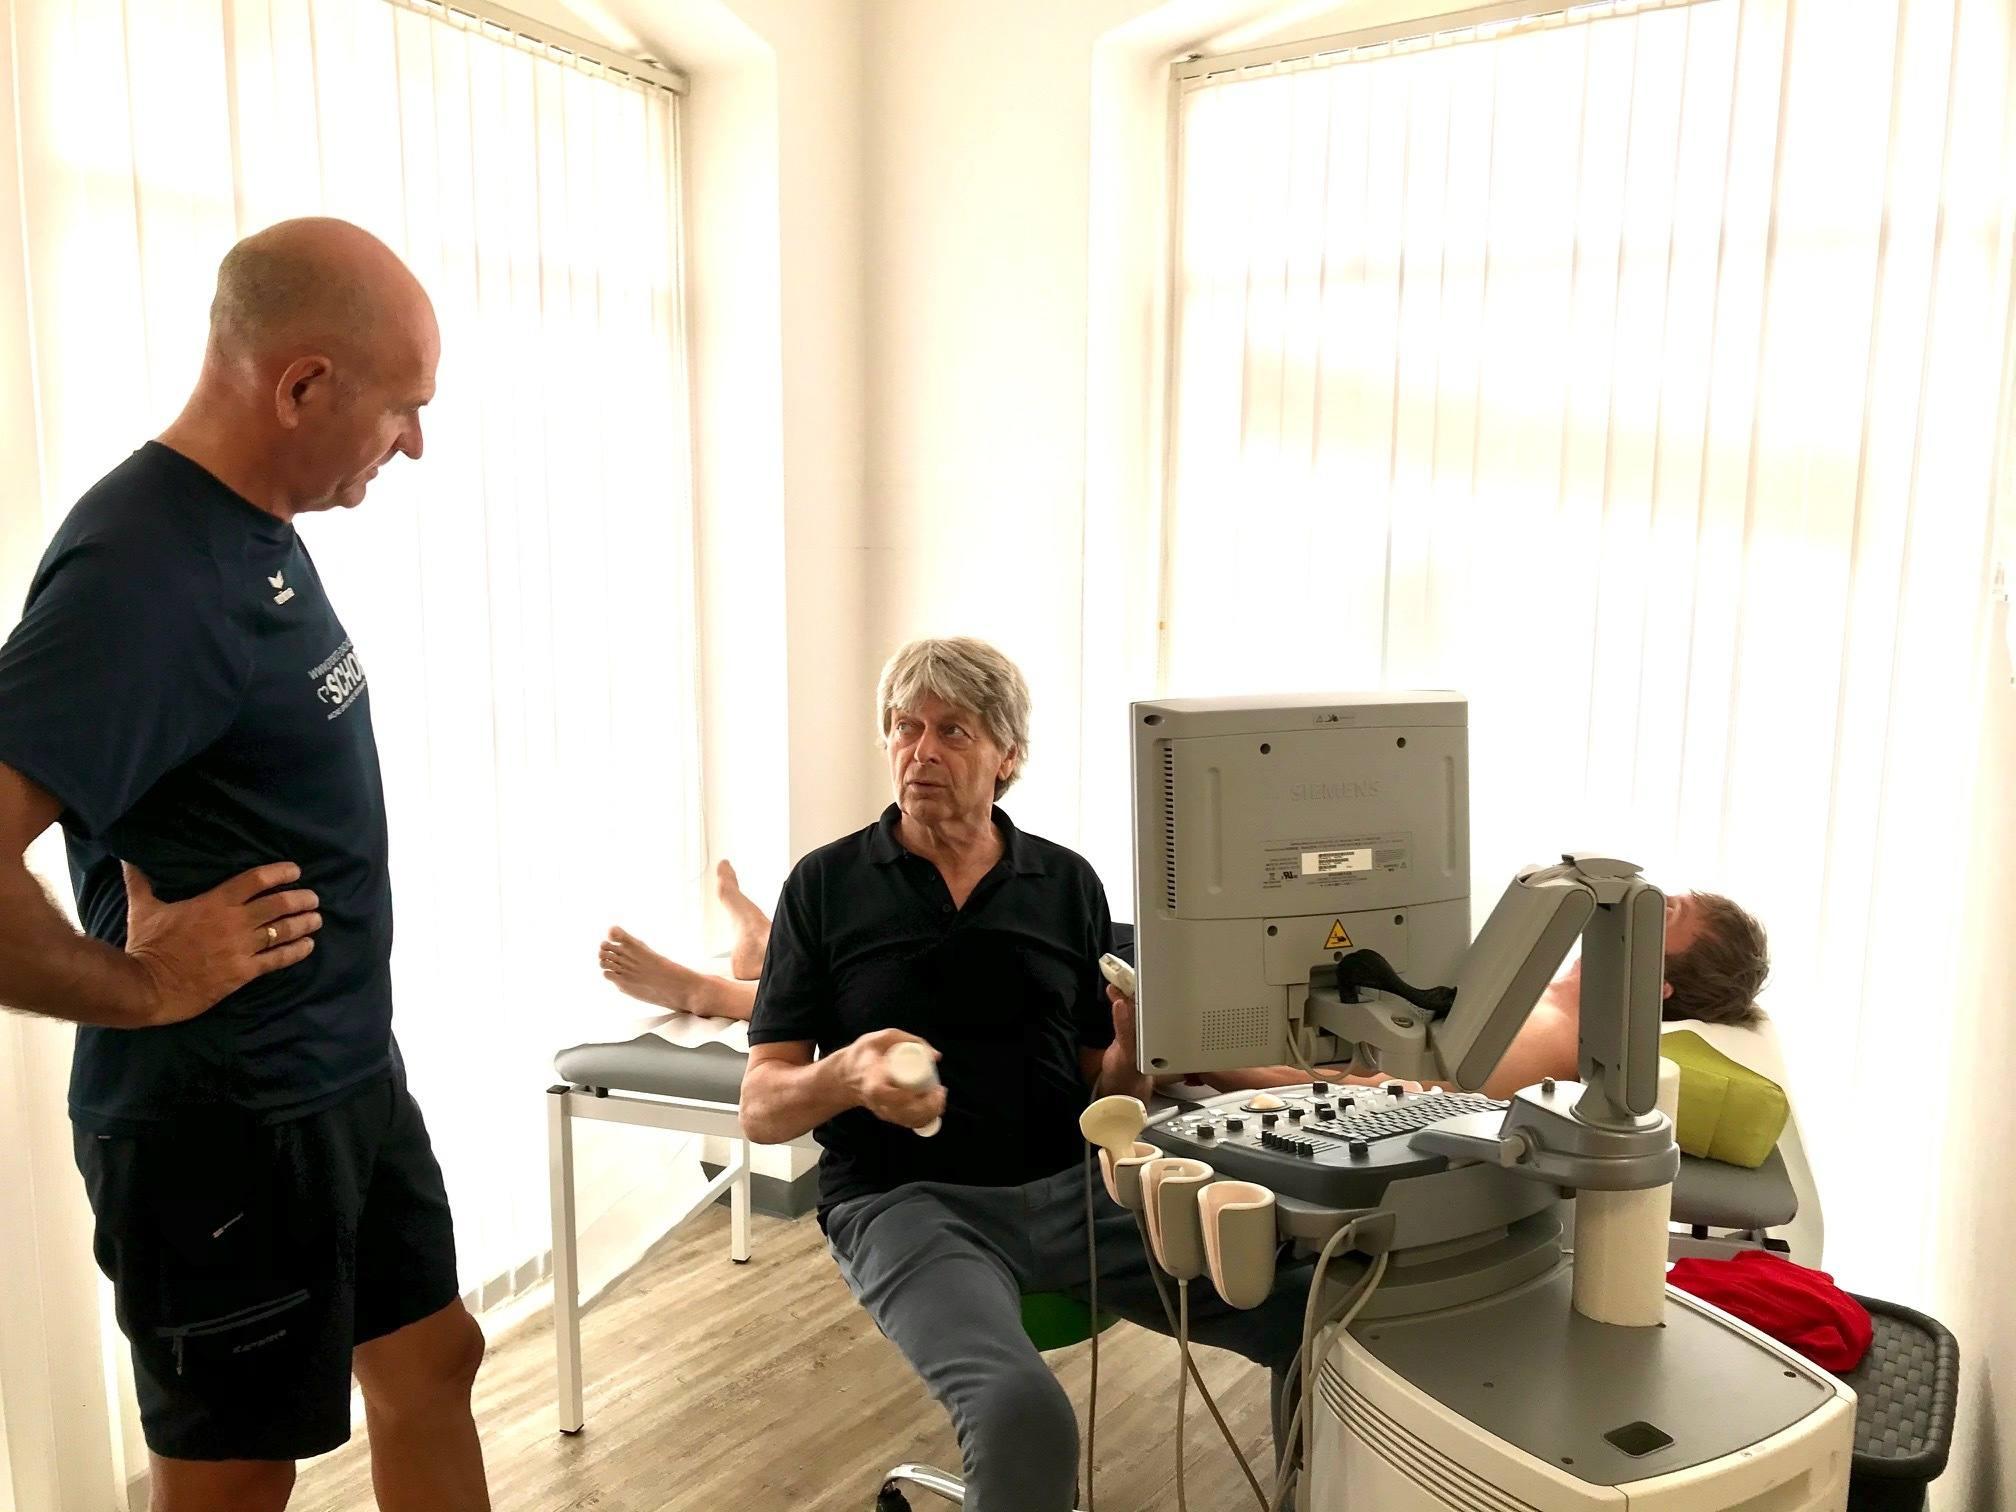 Ultraschall - Medizinischer Check-up für Sportler | SCHORK Sports